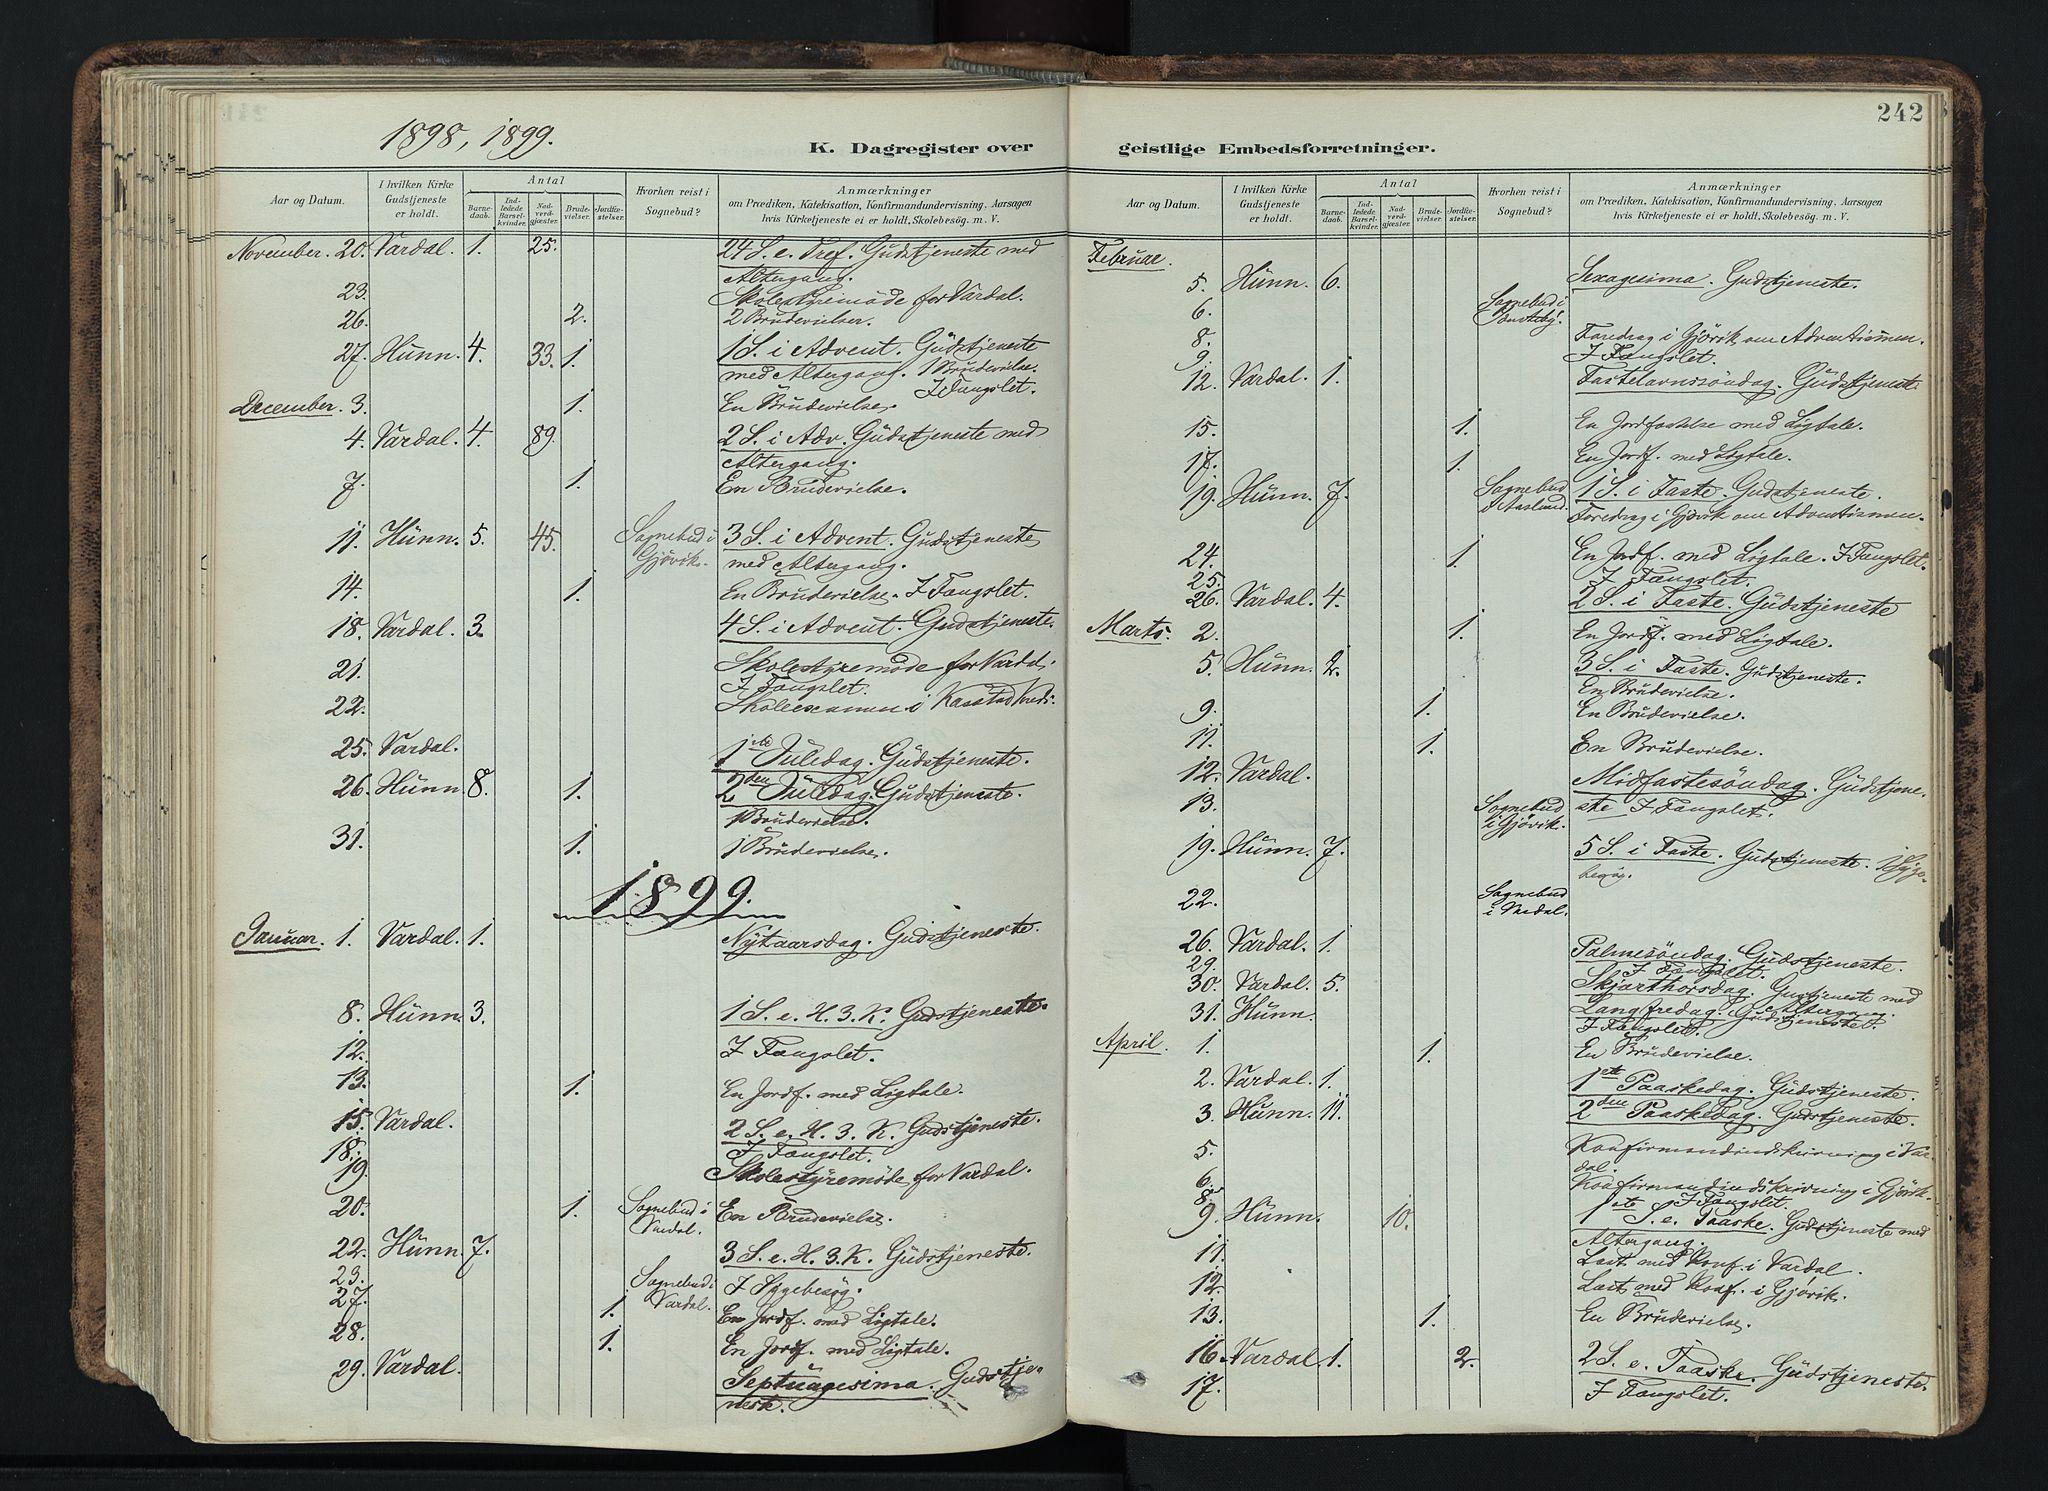 SAH, Vardal prestekontor, H/Ha/Haa/L0019: Ministerialbok nr. 19, 1893-1907, s. 242